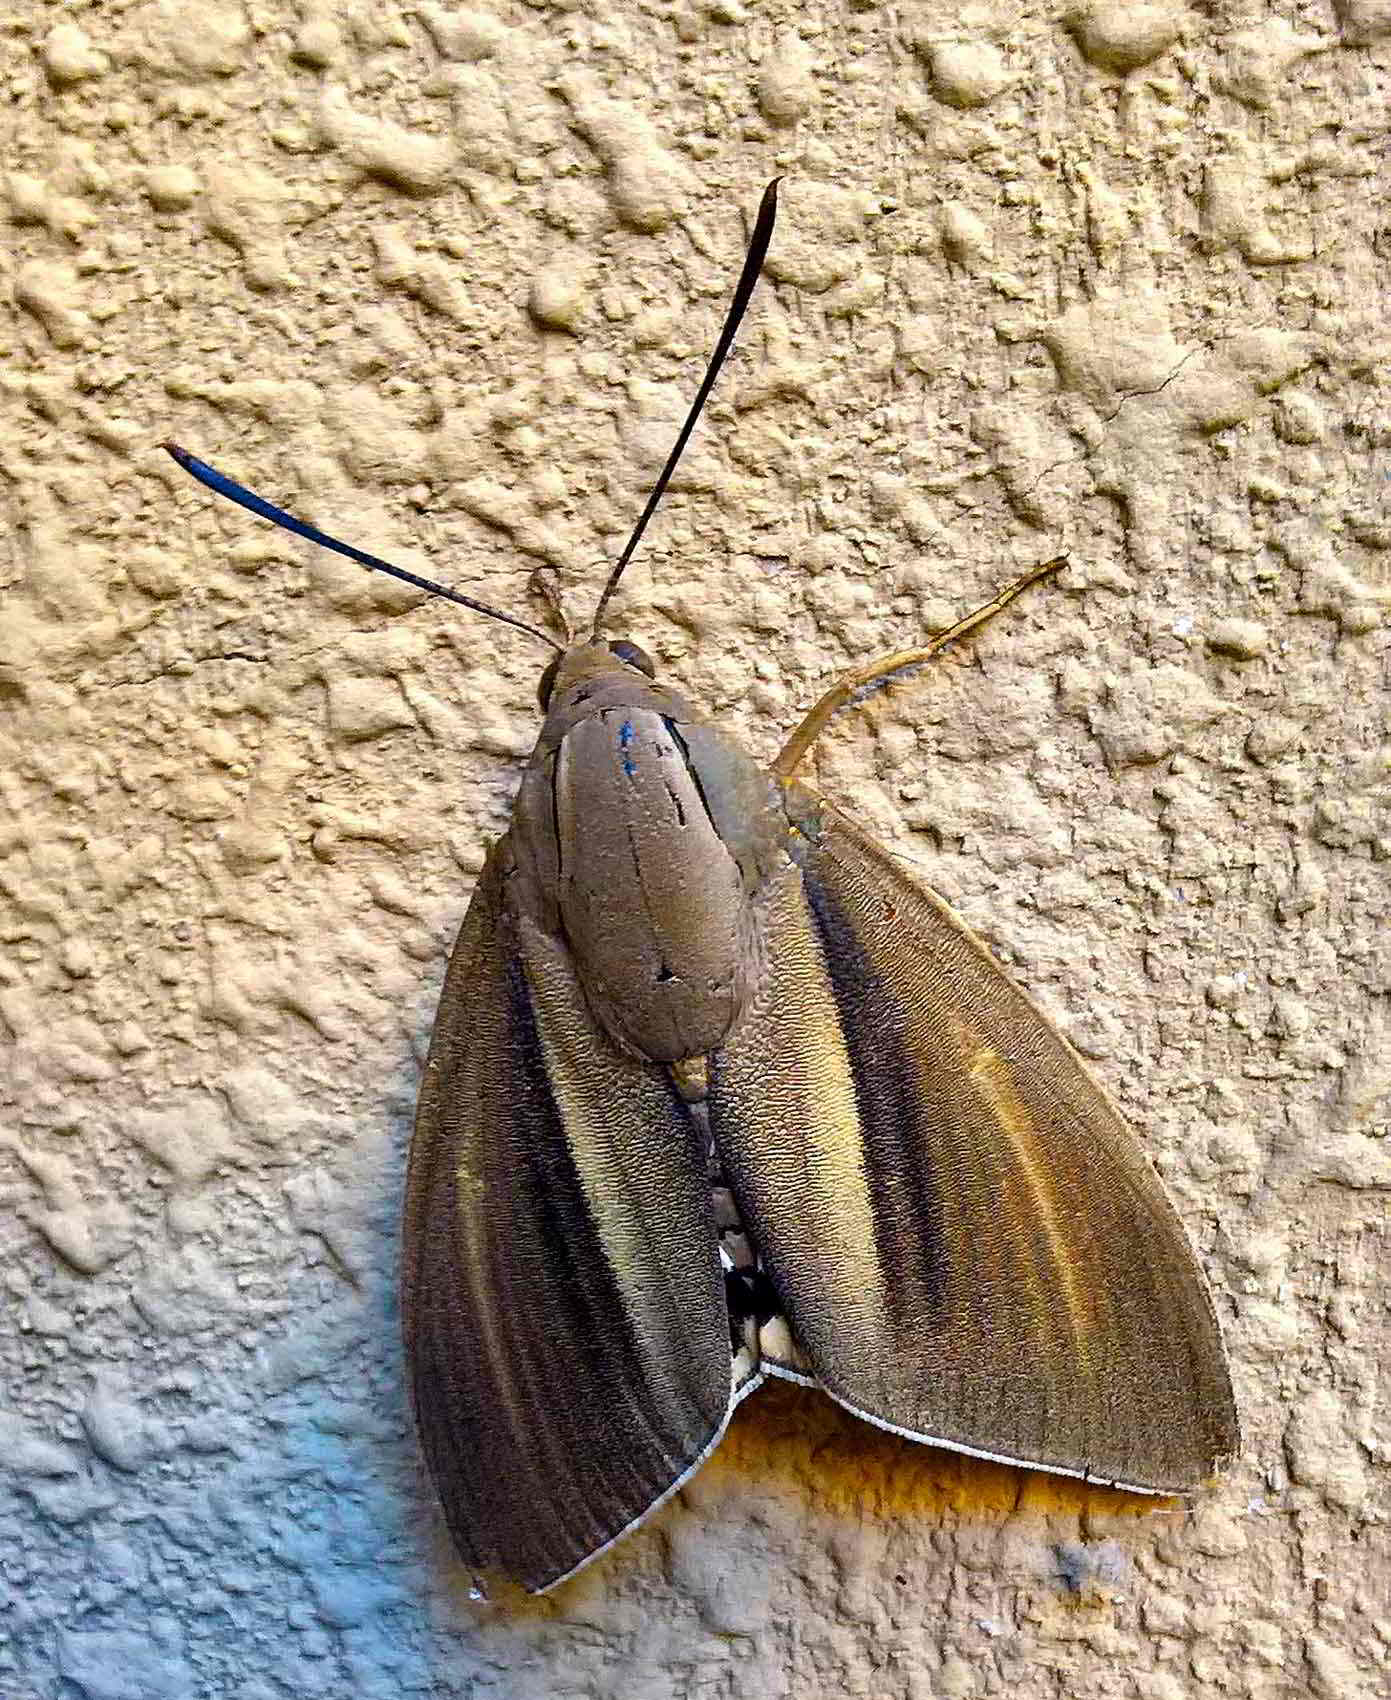 Conferma o meno individuazione Paysandisia Archon,Castniidae.